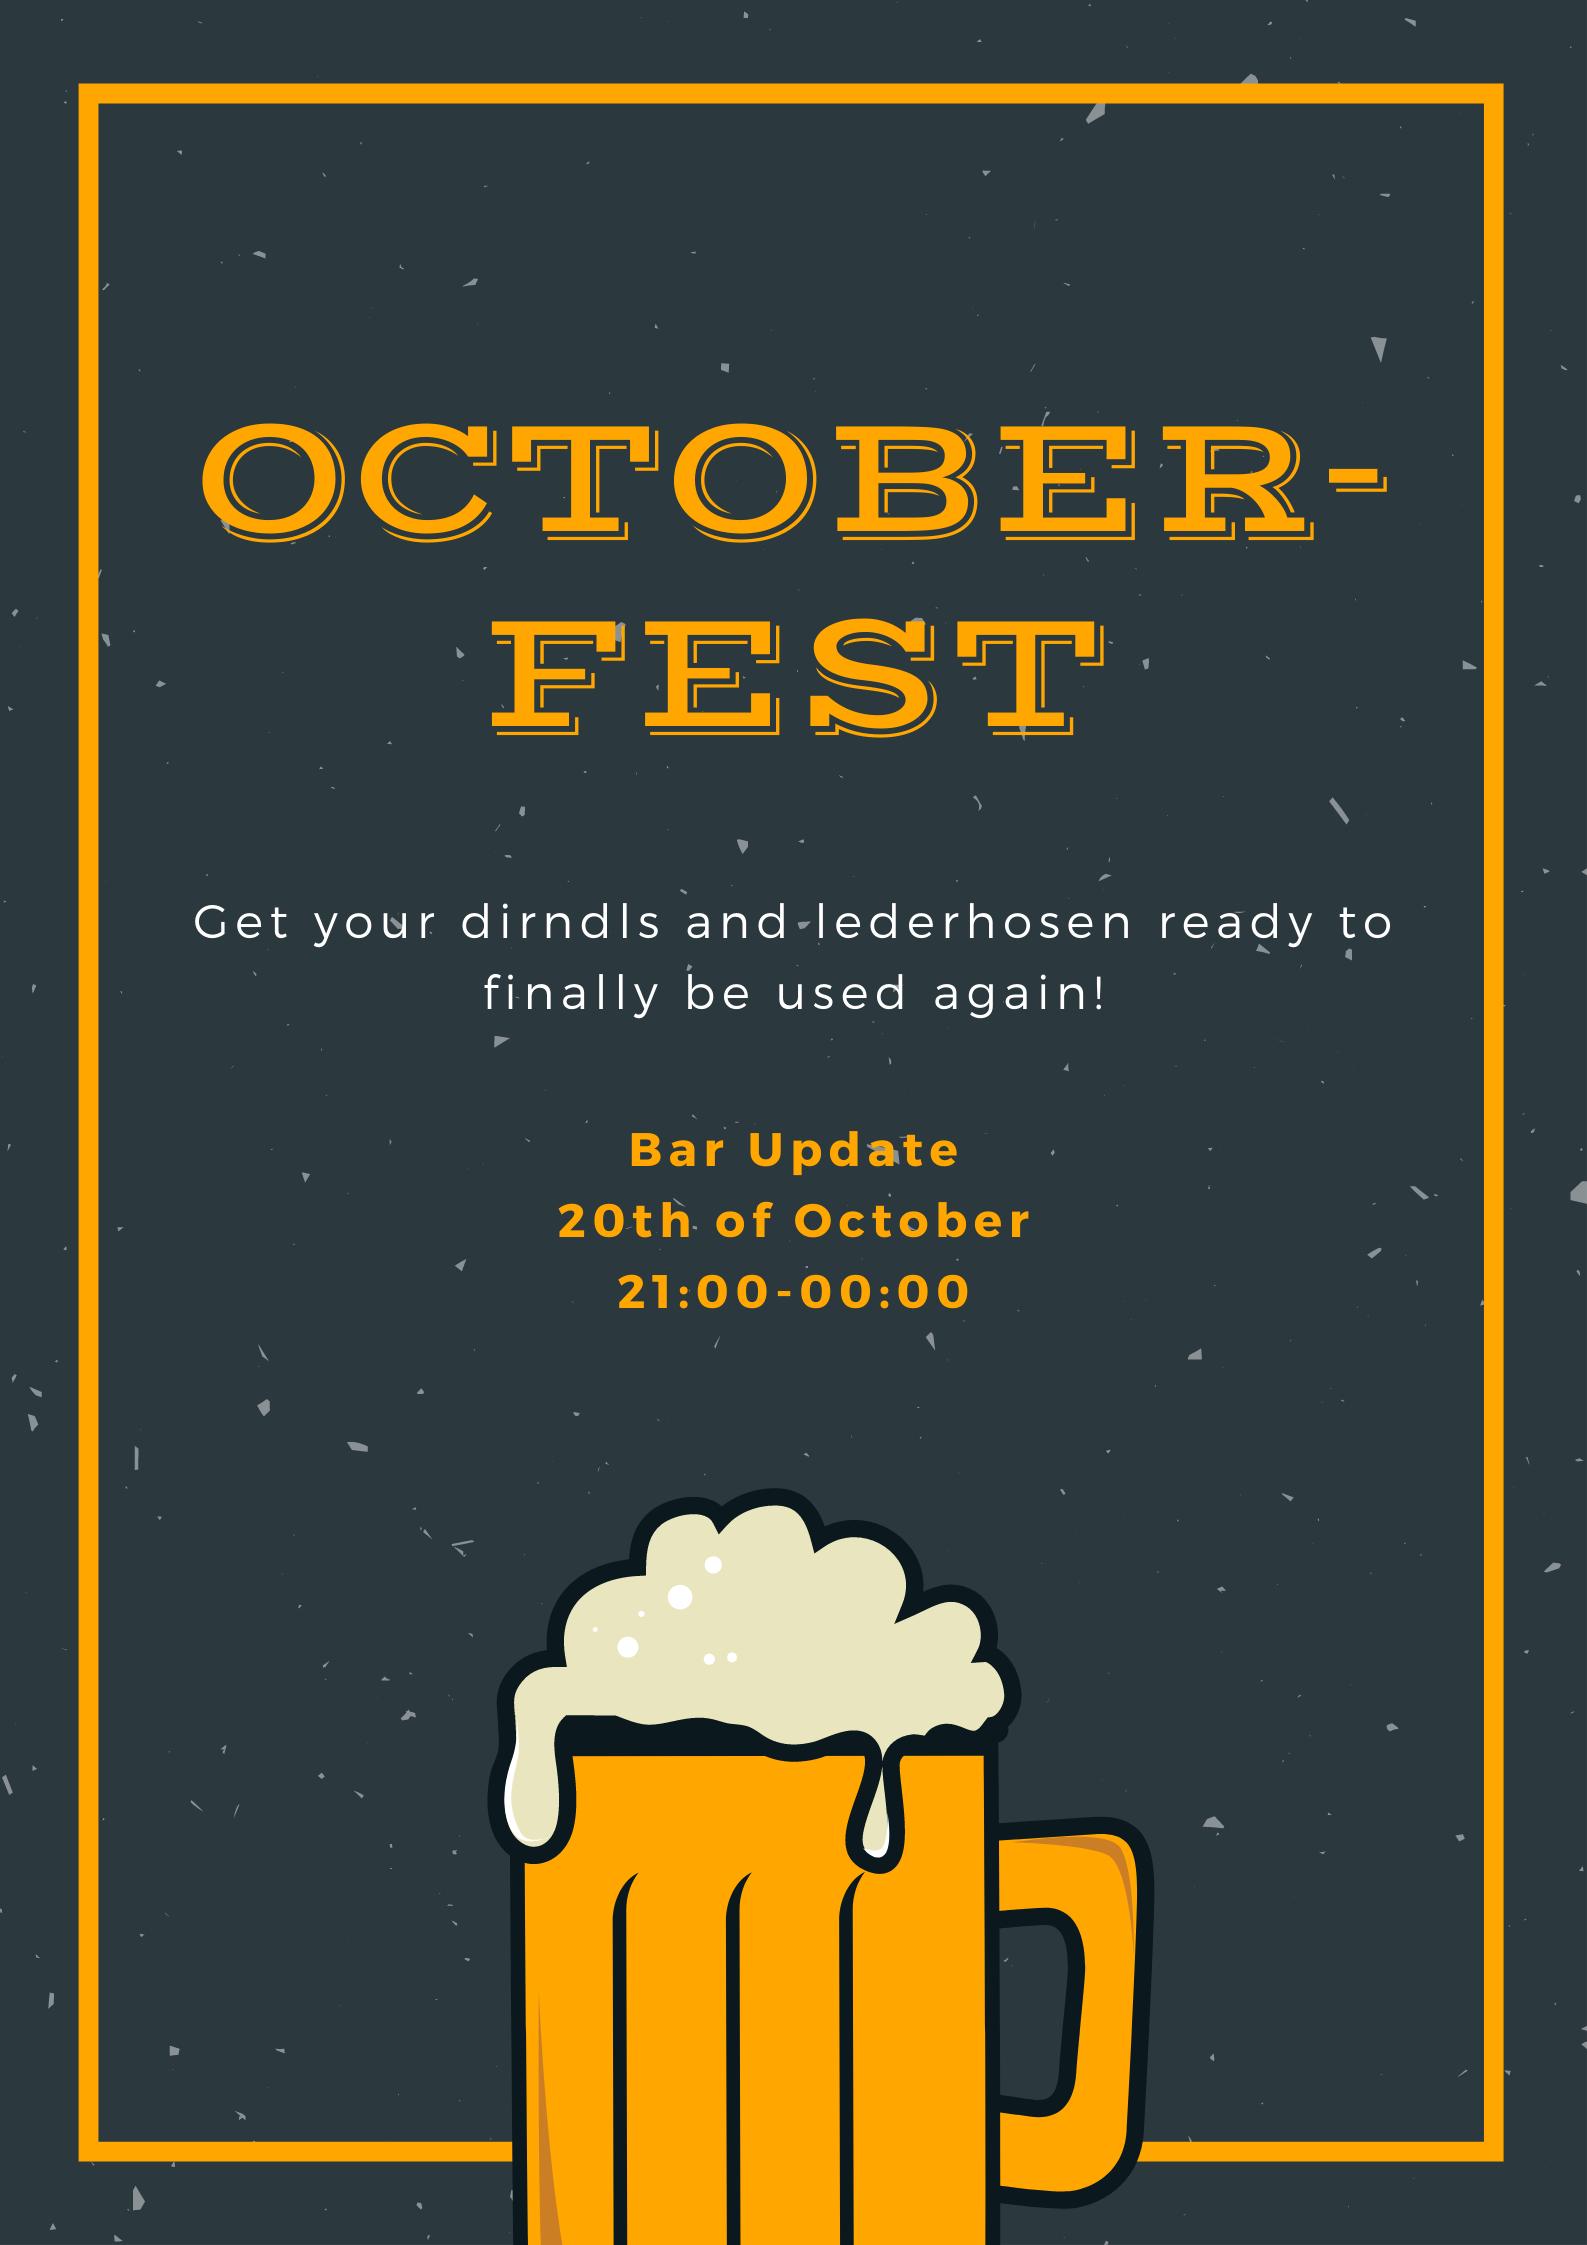 Update Drink: Octoberfest